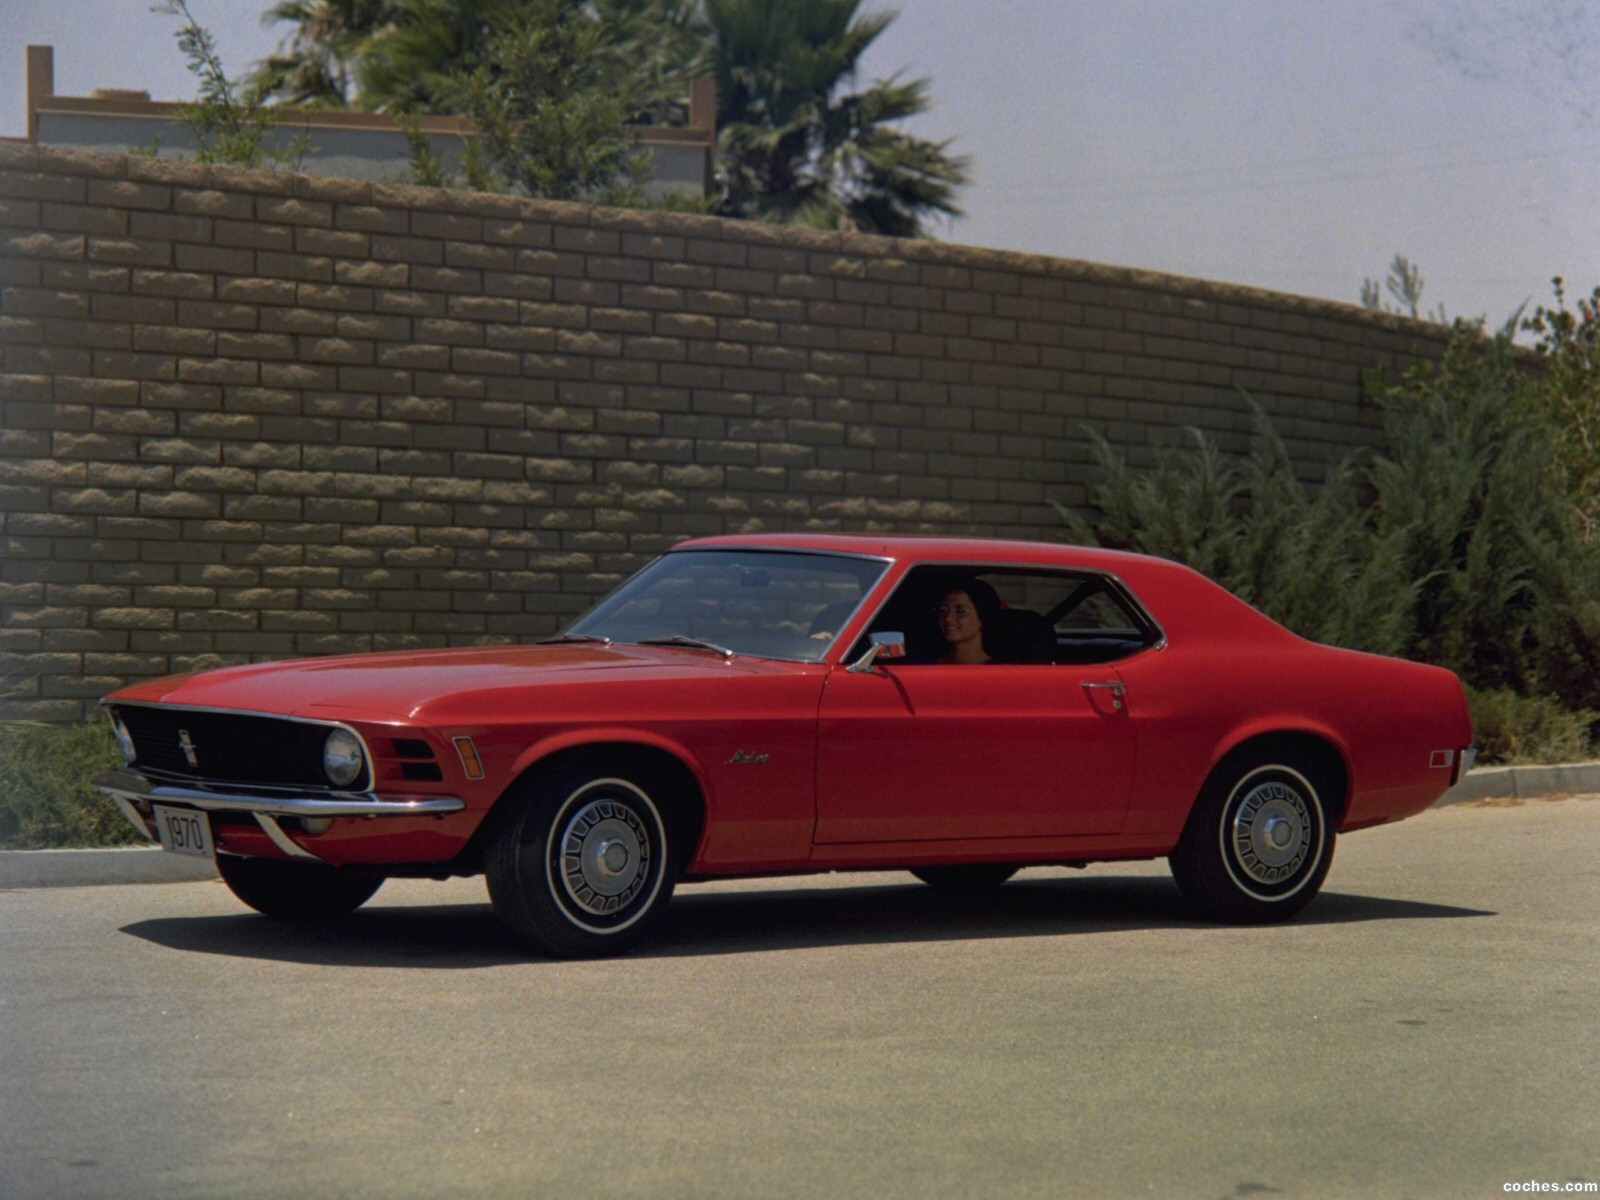 Foto 1 de Ford Mustang 1964